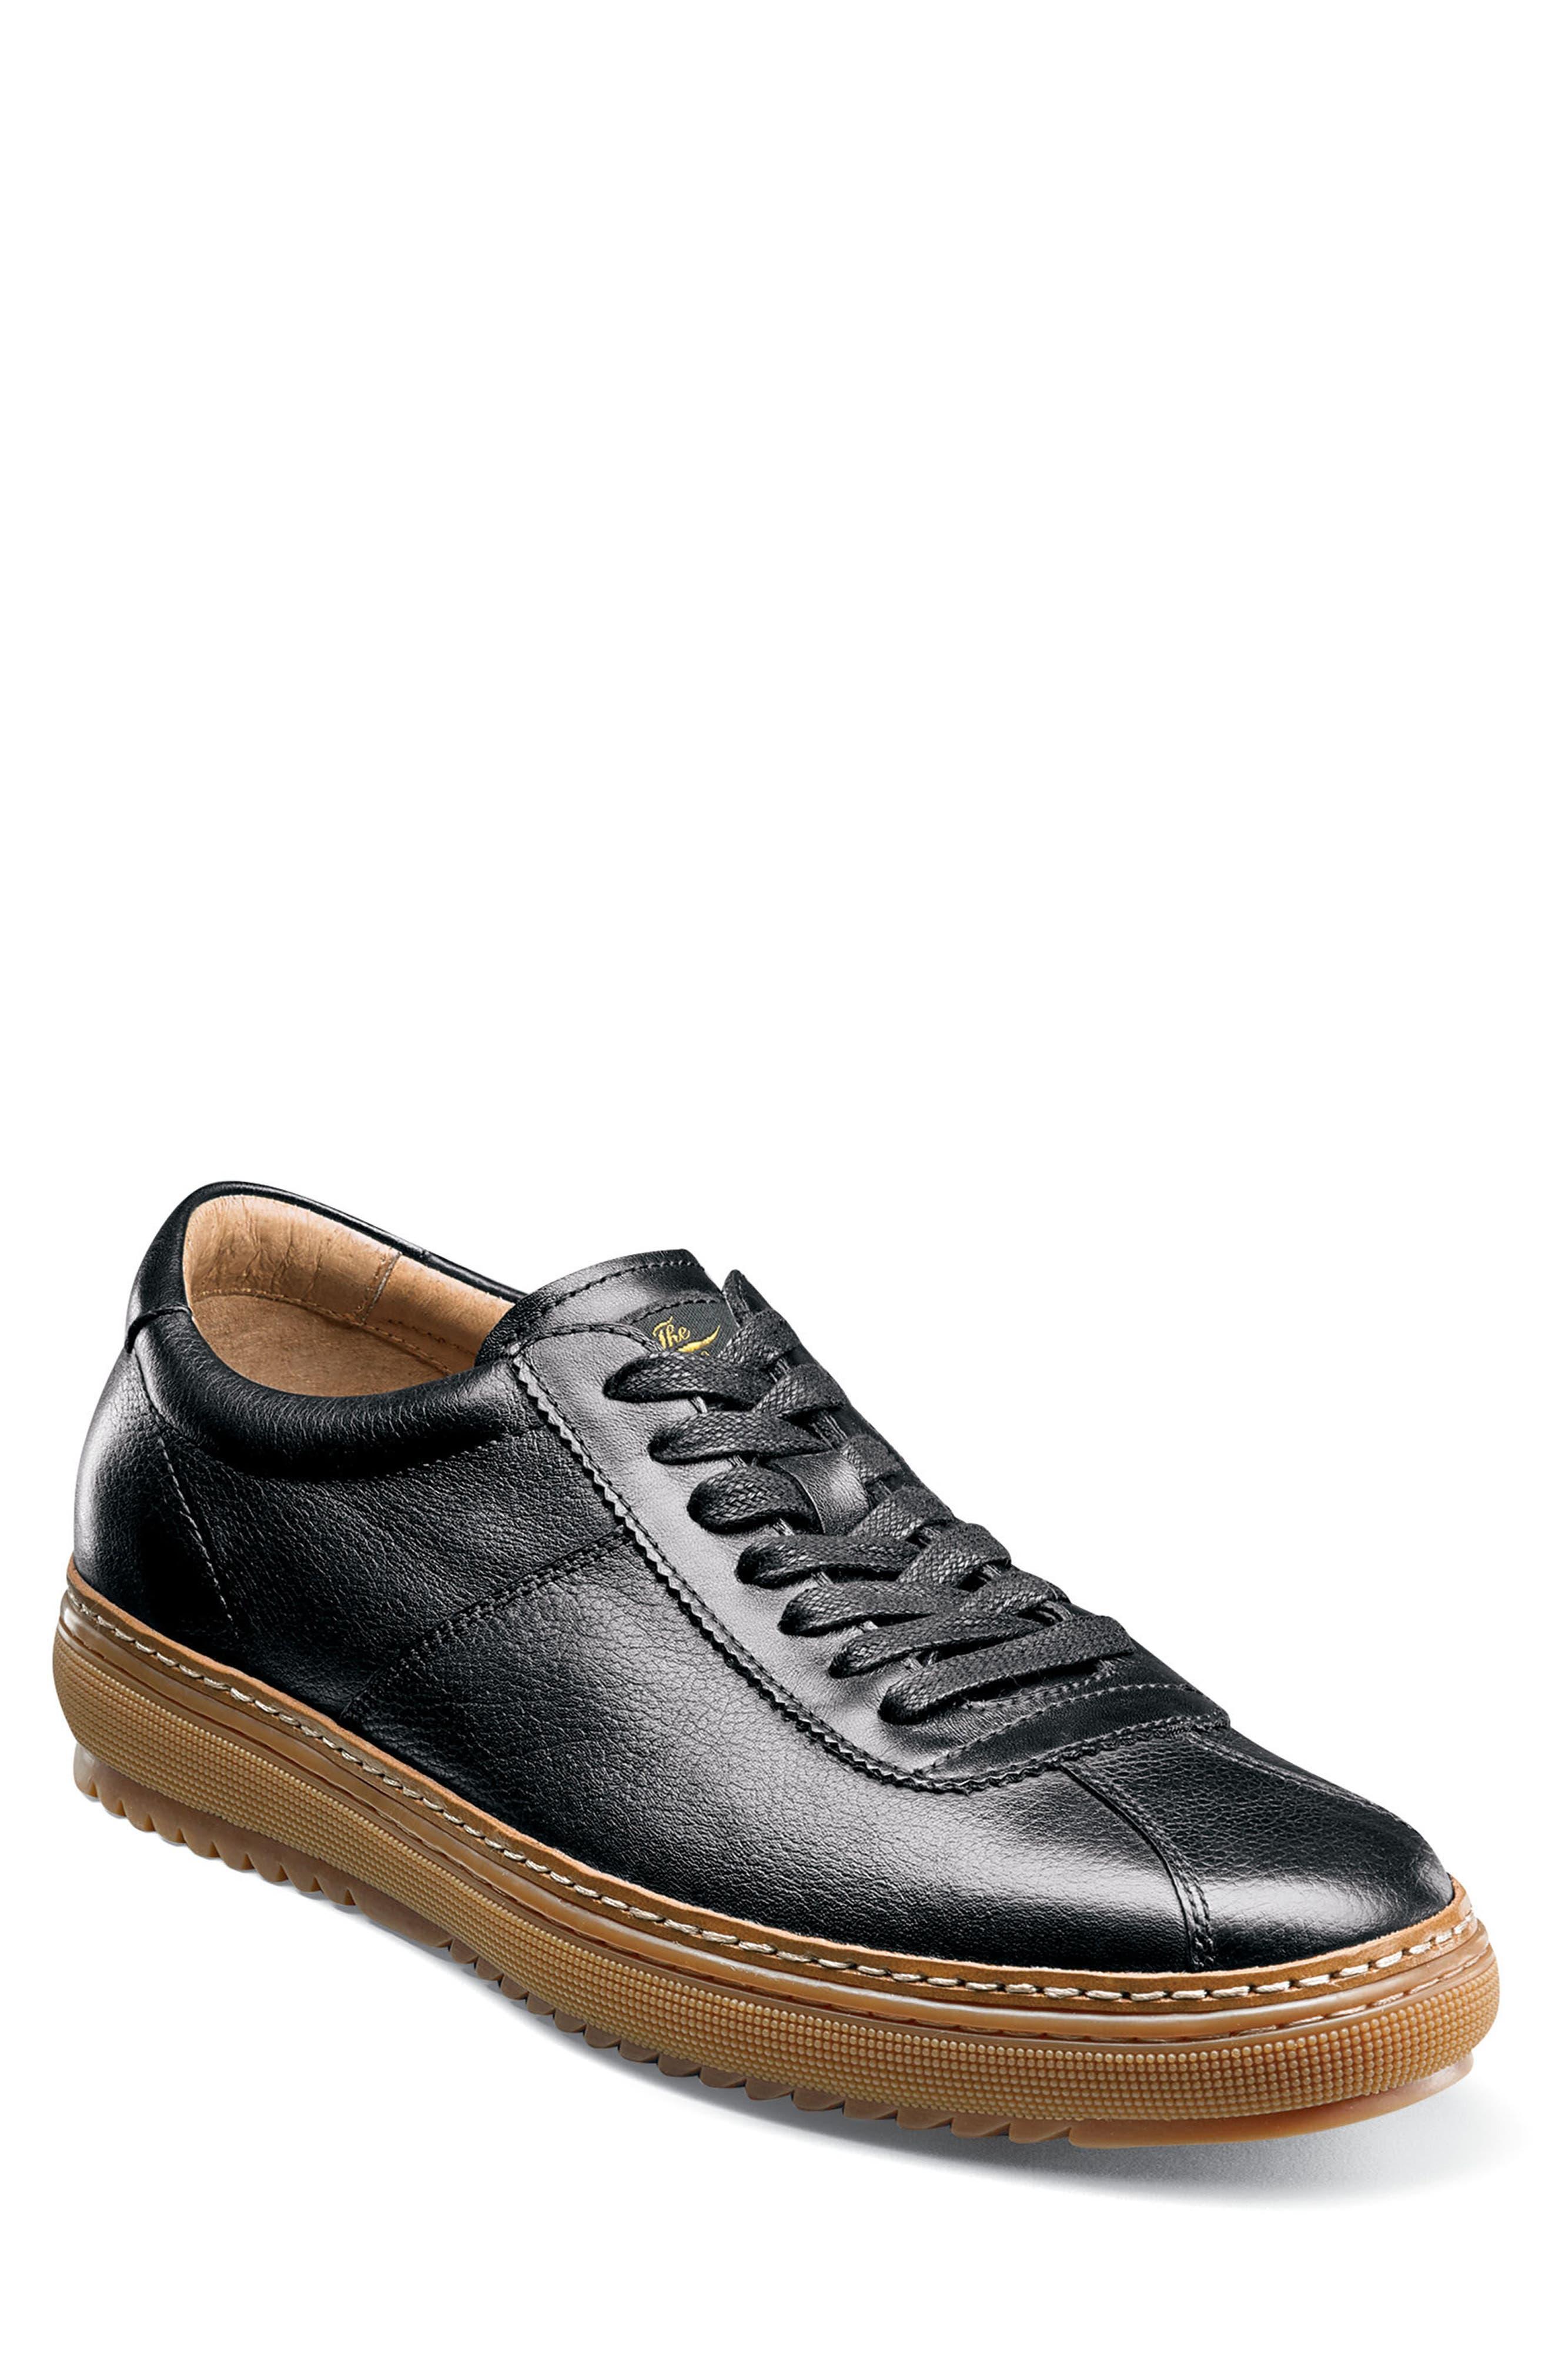 Crew Sneaker,                         Main,                         color, 001